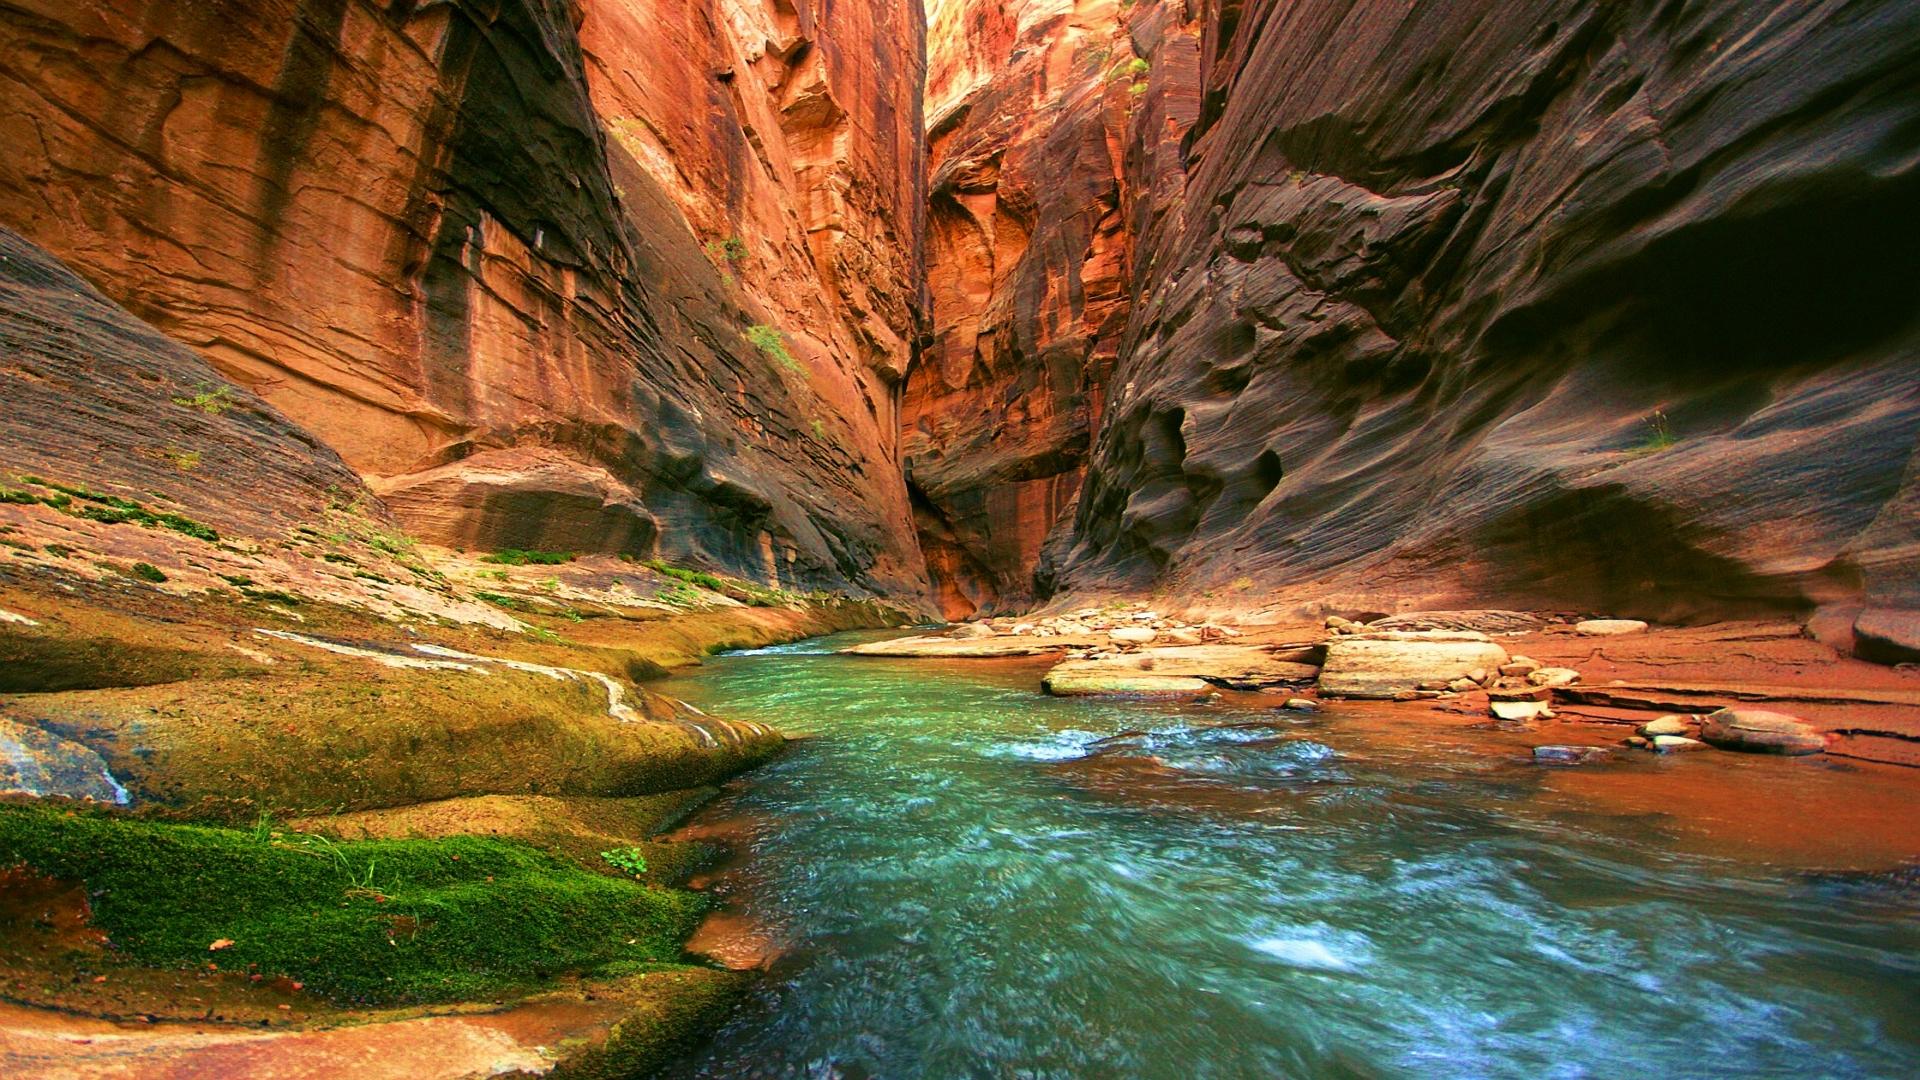 grand canyon 1920x1080 wallpaper - photo #32